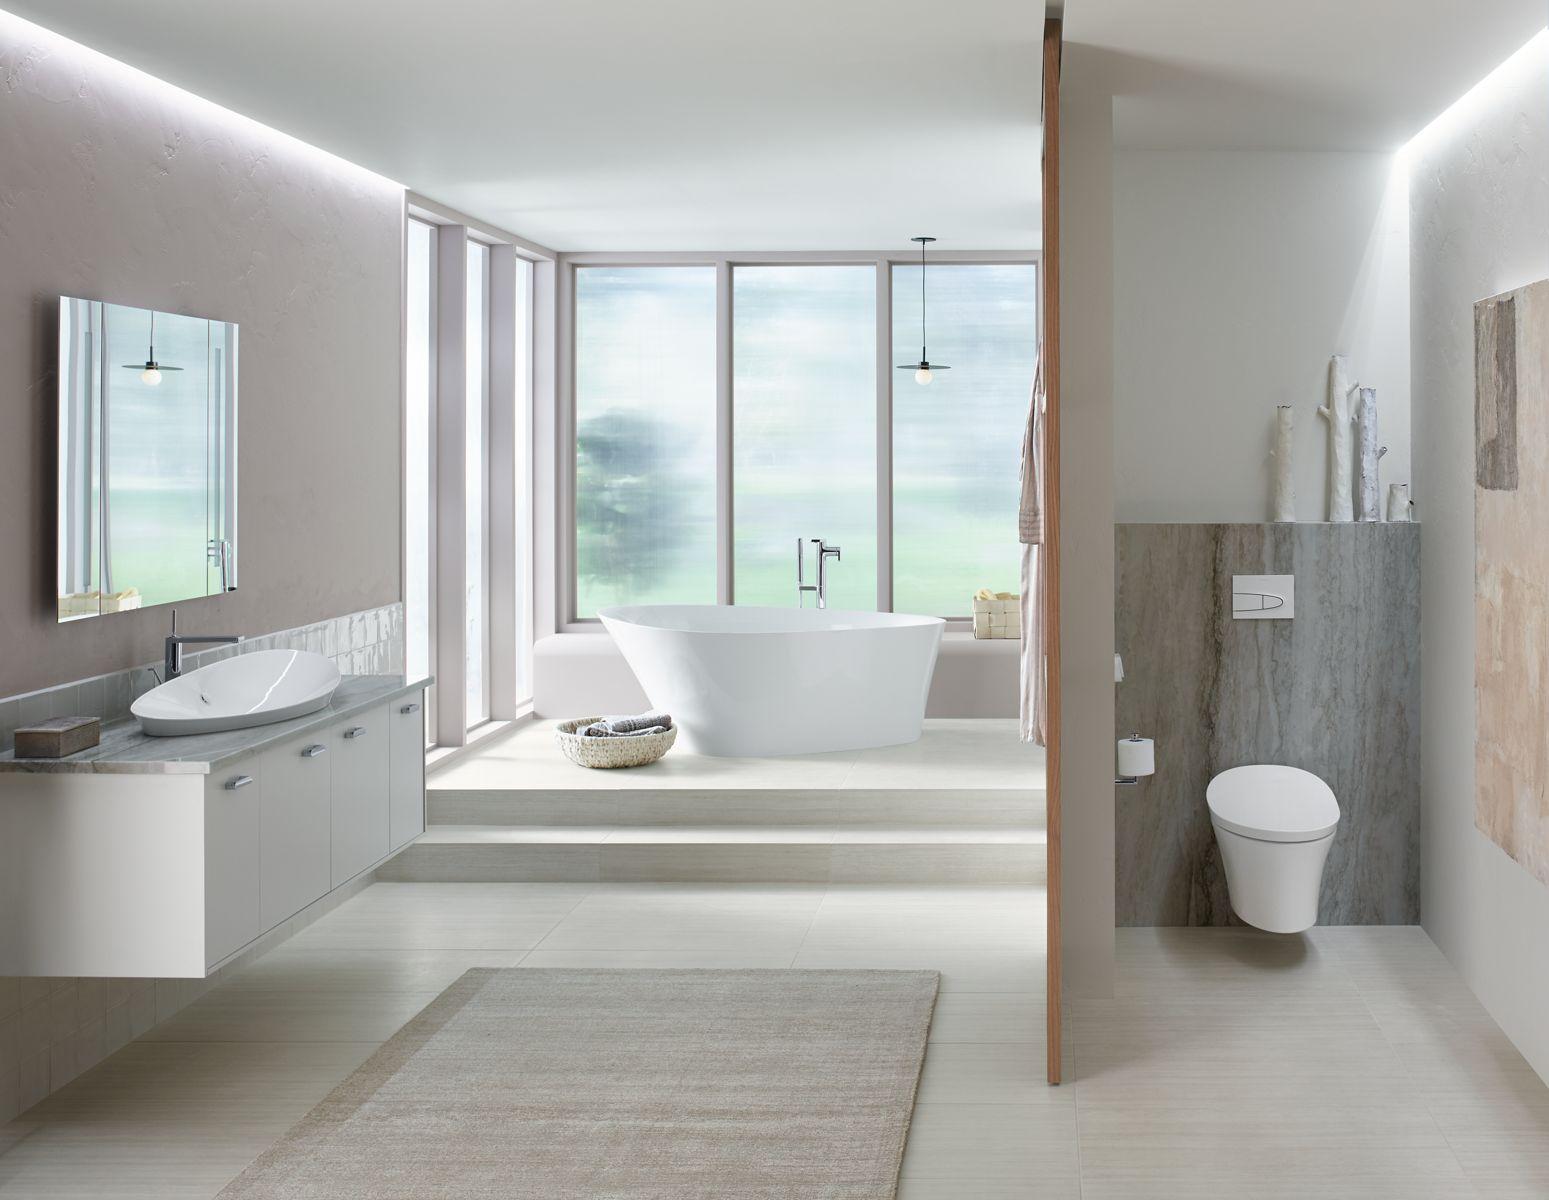 KOHLER Veil Bathroom Collection Epitomizes Warm Minimalism | 2018 ...